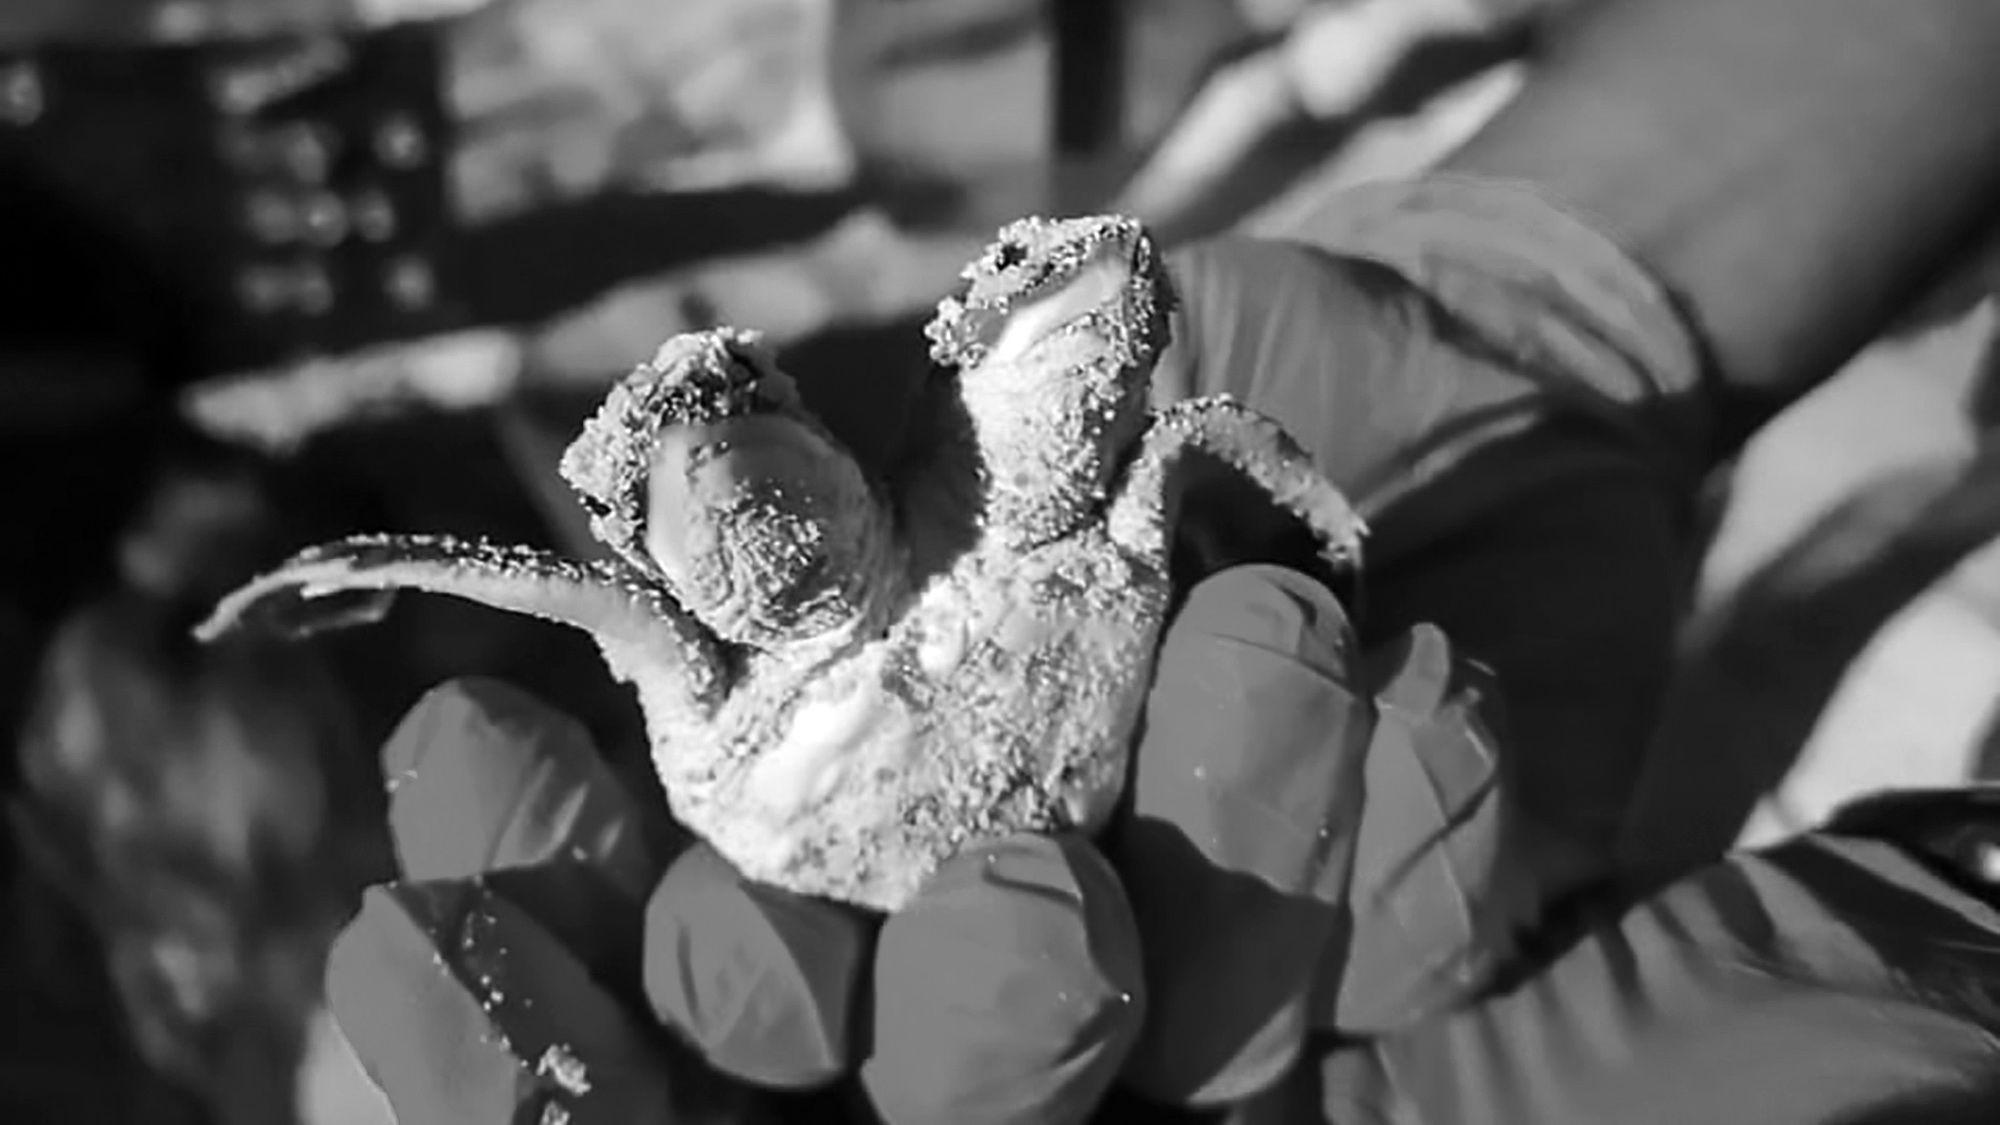 Mutant Two-Headed Turtle Born On Paradise Island